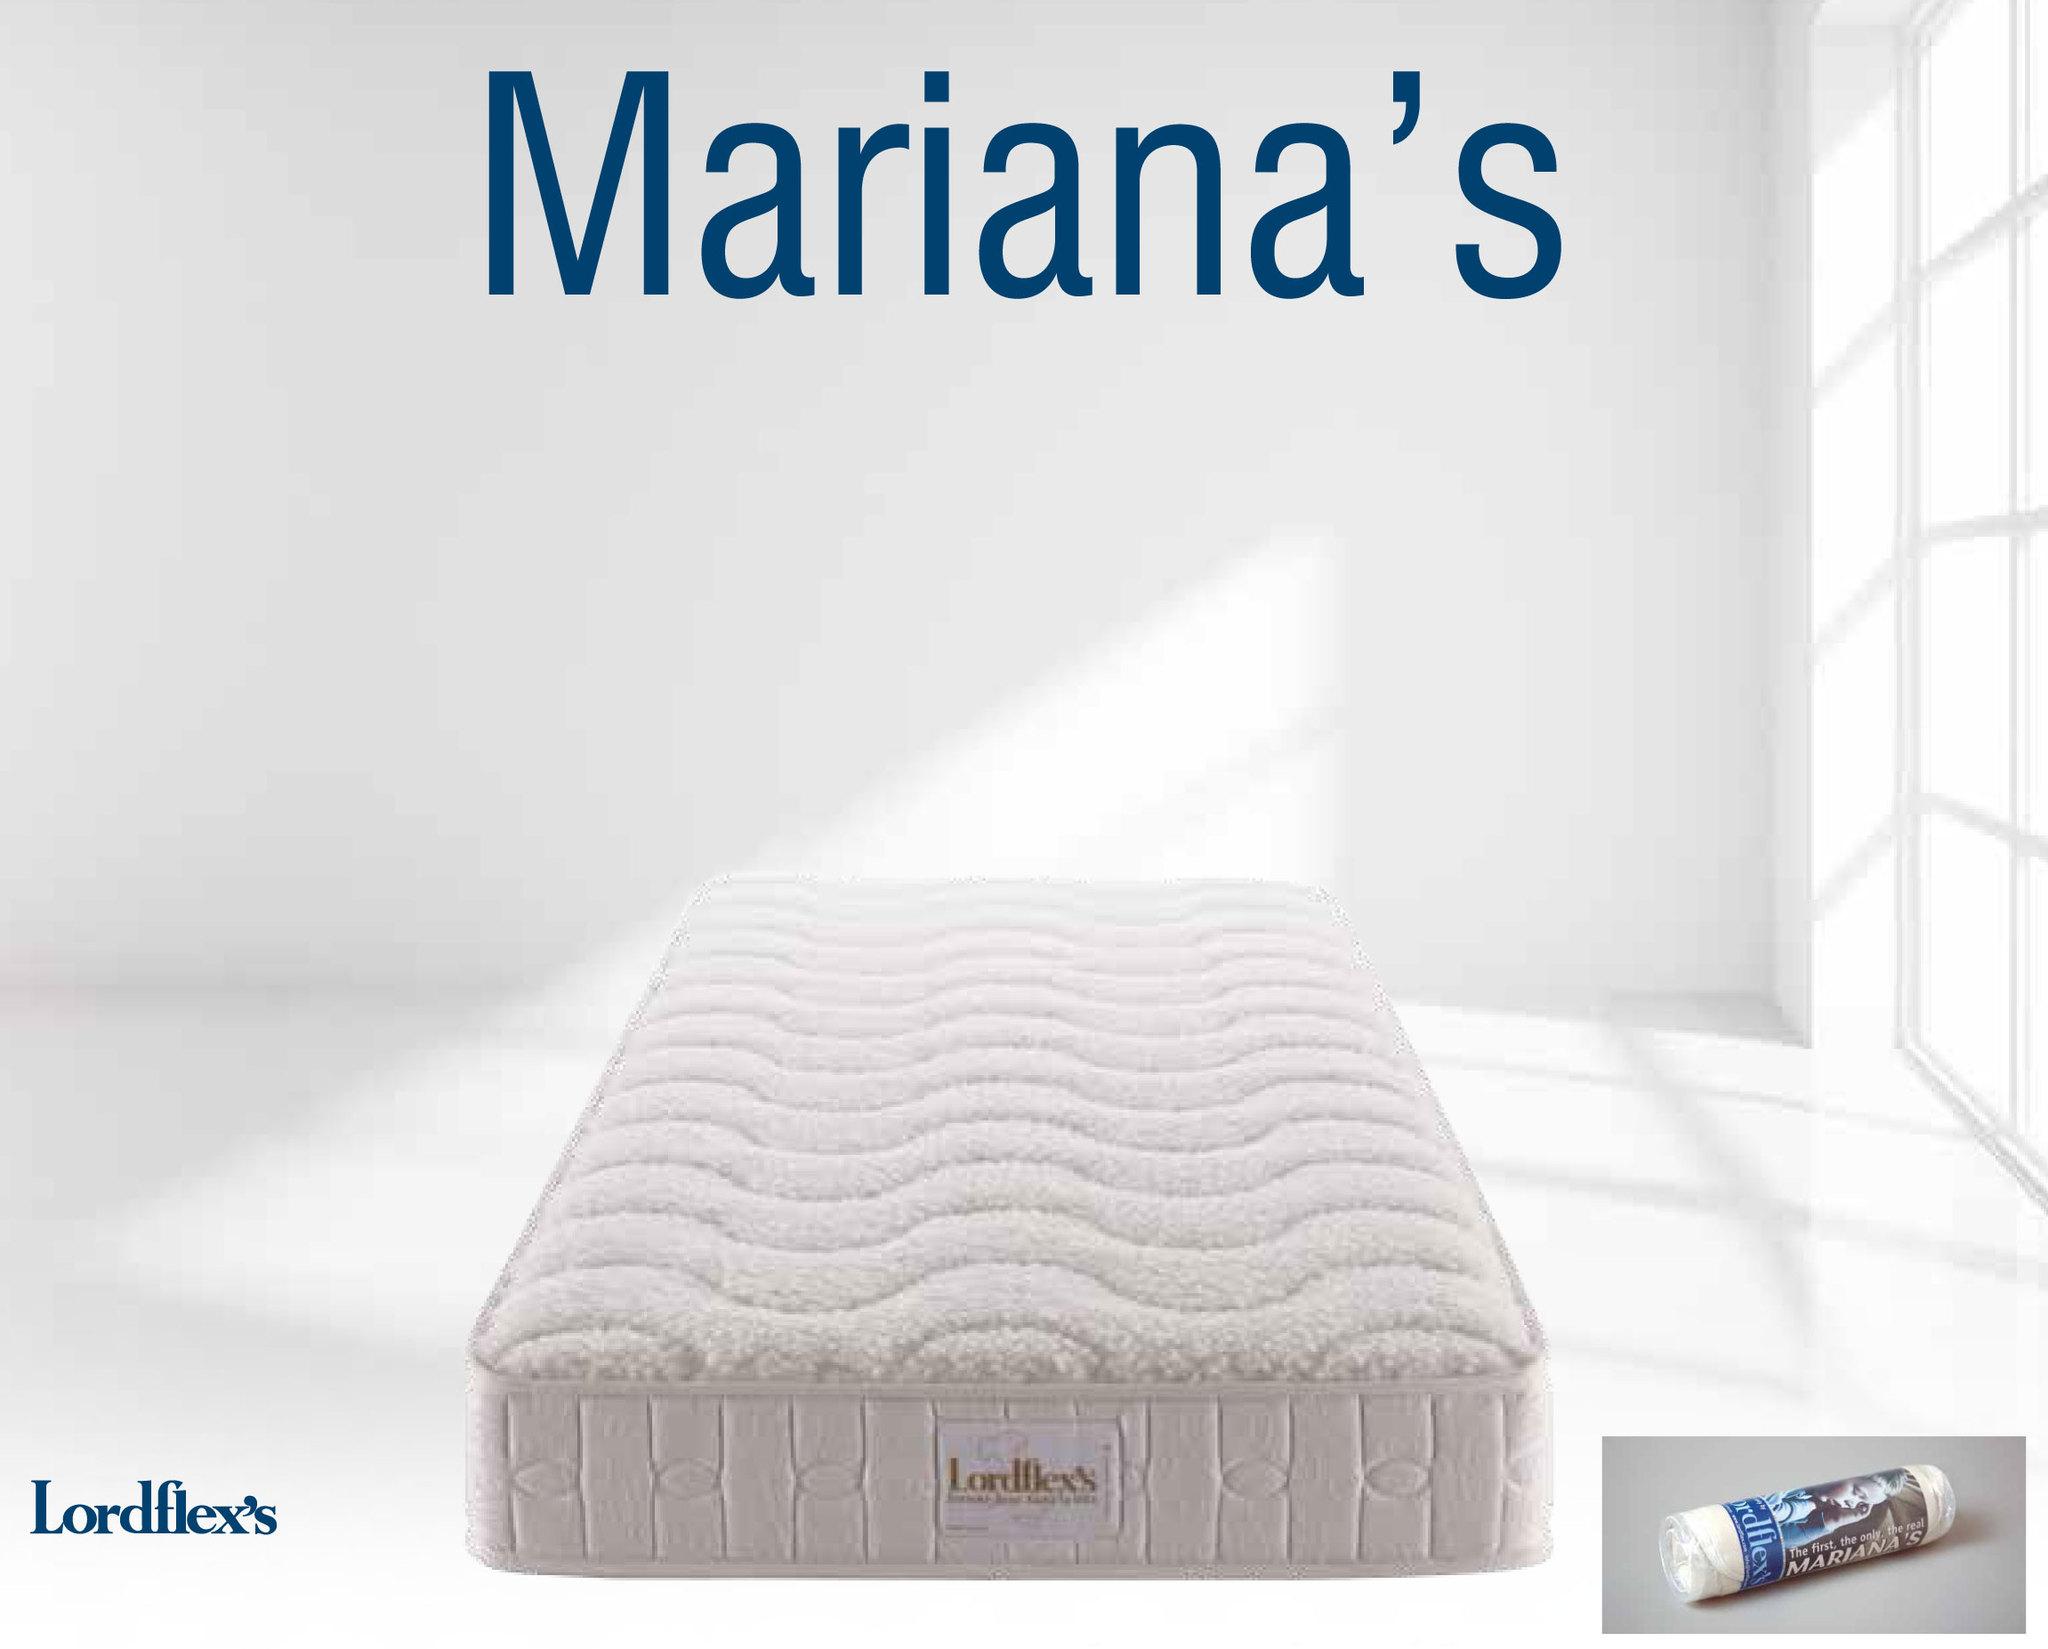 Матрасы Матрас ортопедический Lordflex's Mariana's 180х190 до 140 кг 1_Mariana_s.jpg